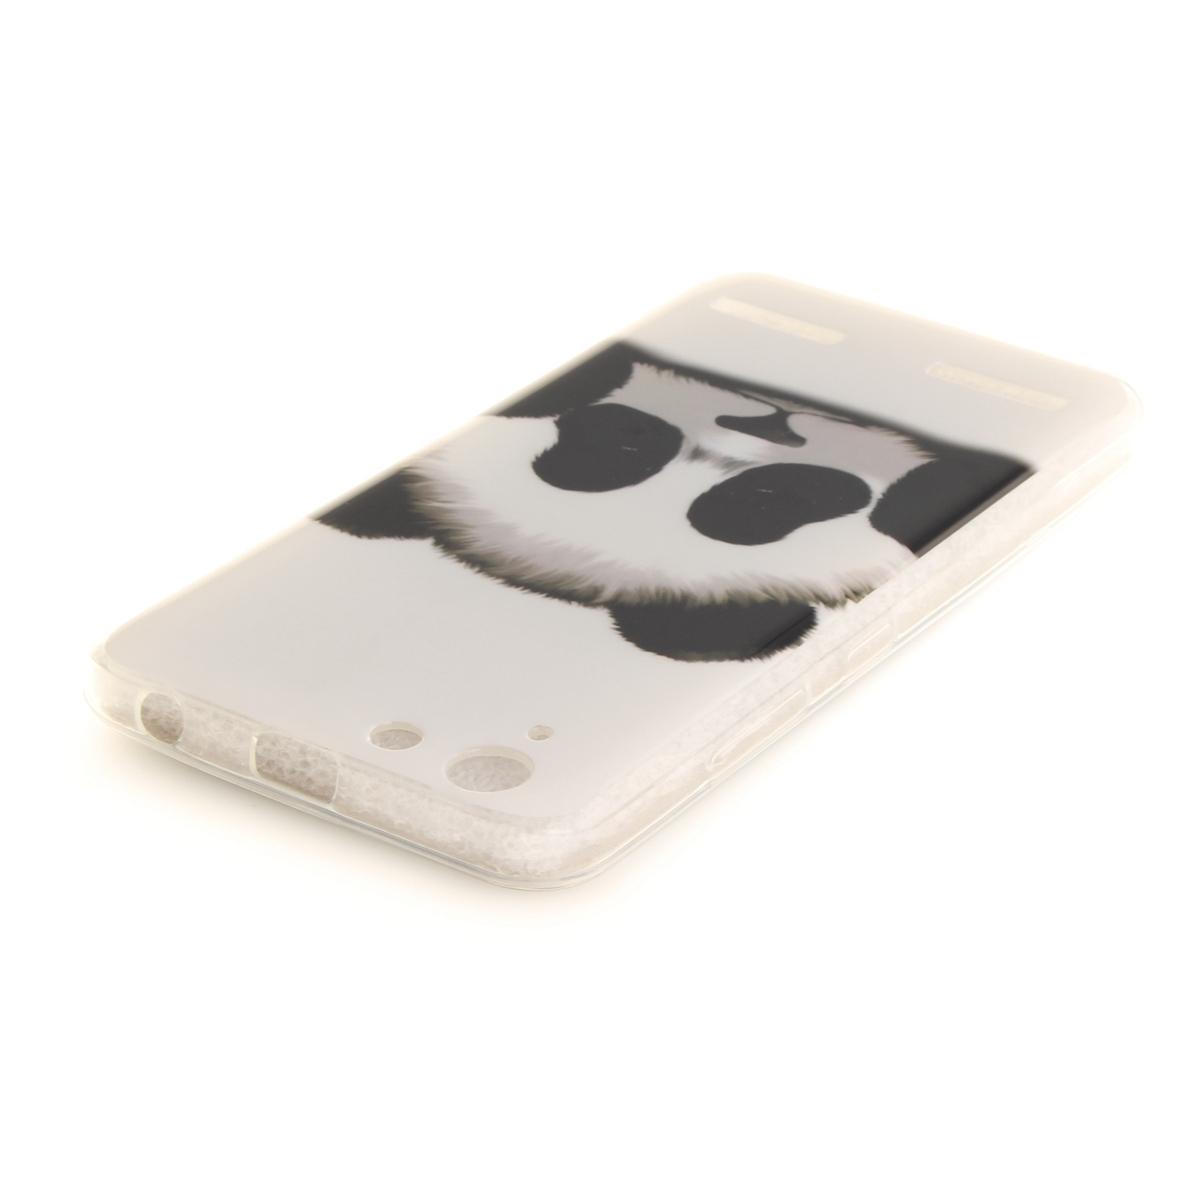 ... Fit Soft TPU Phone Back Case Cover For Lenovo Vibe K5 (Panda) -intl ...